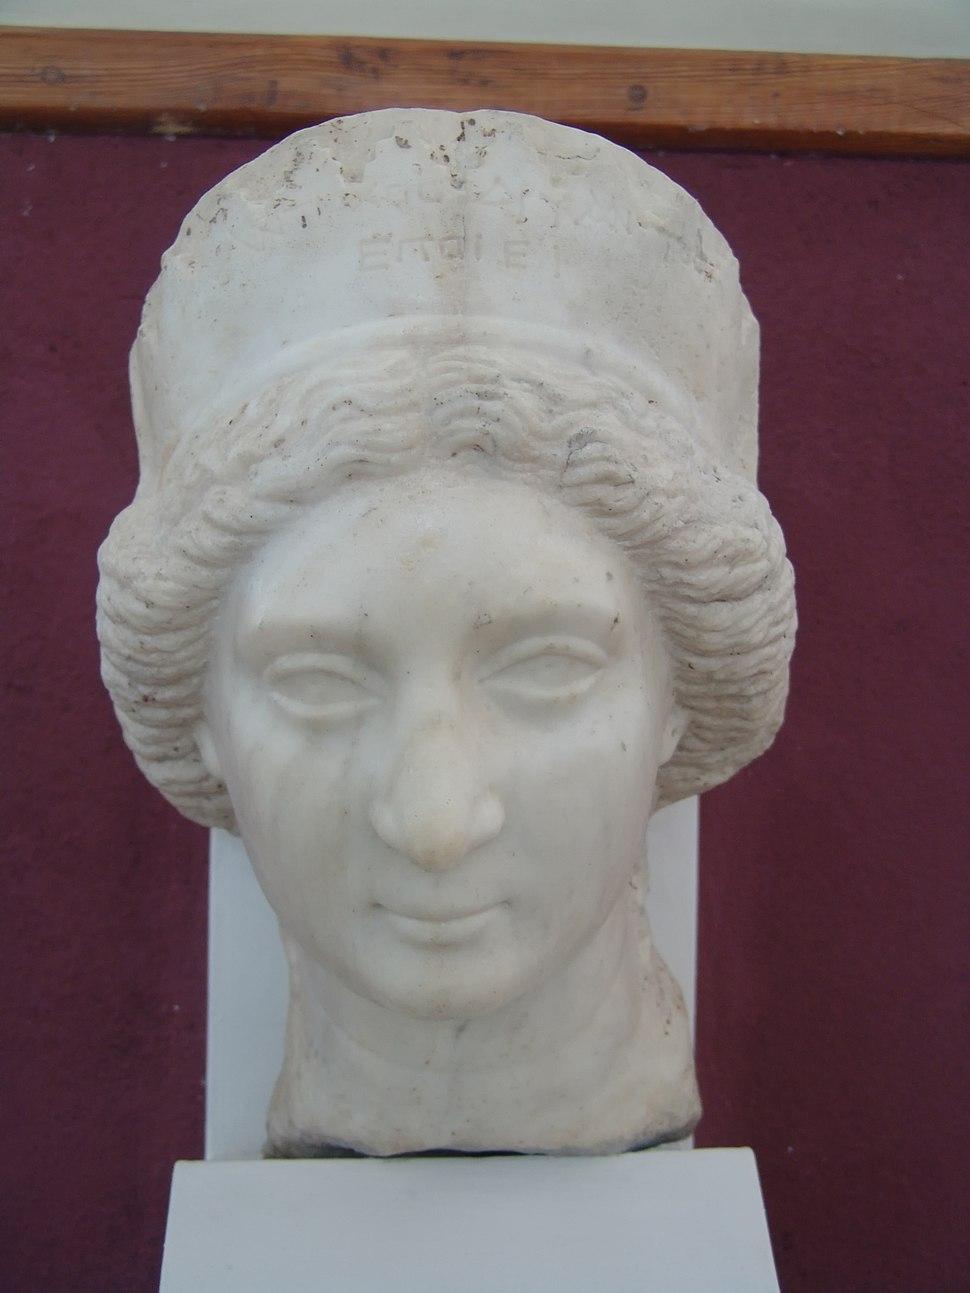 Parthian Queen Bust